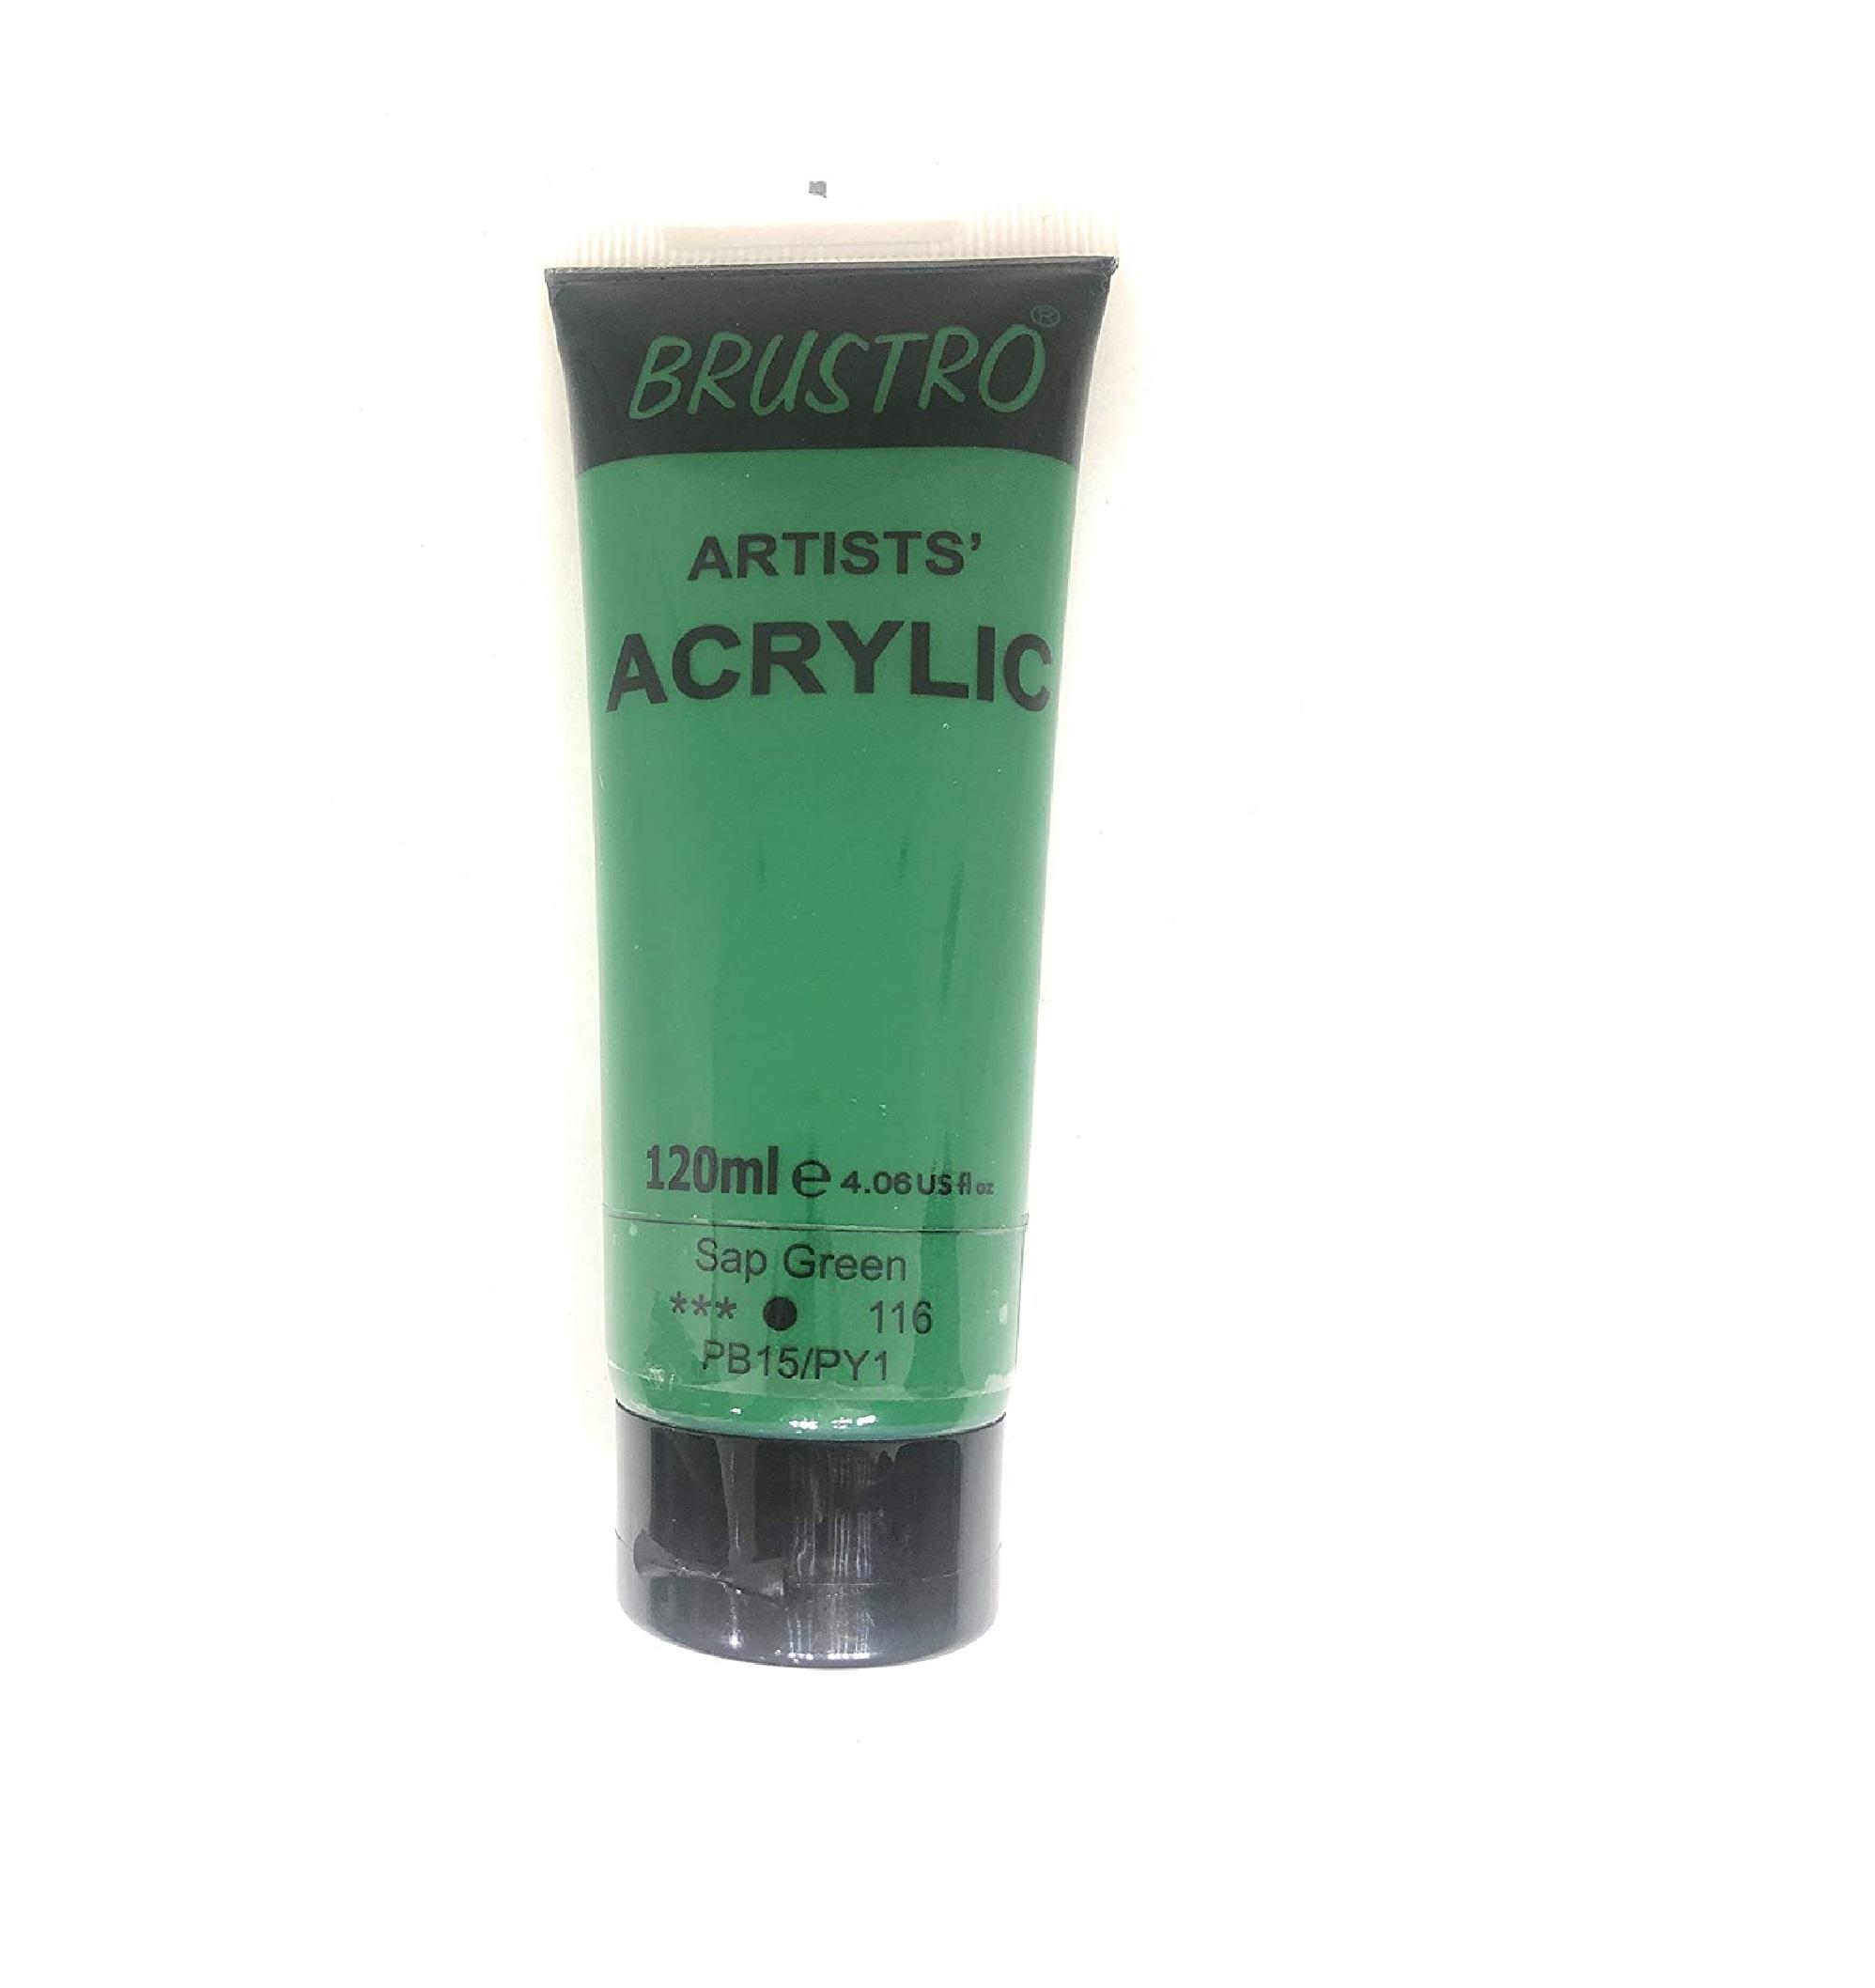 Brustro Artists Acrylic 120ml Sap Green